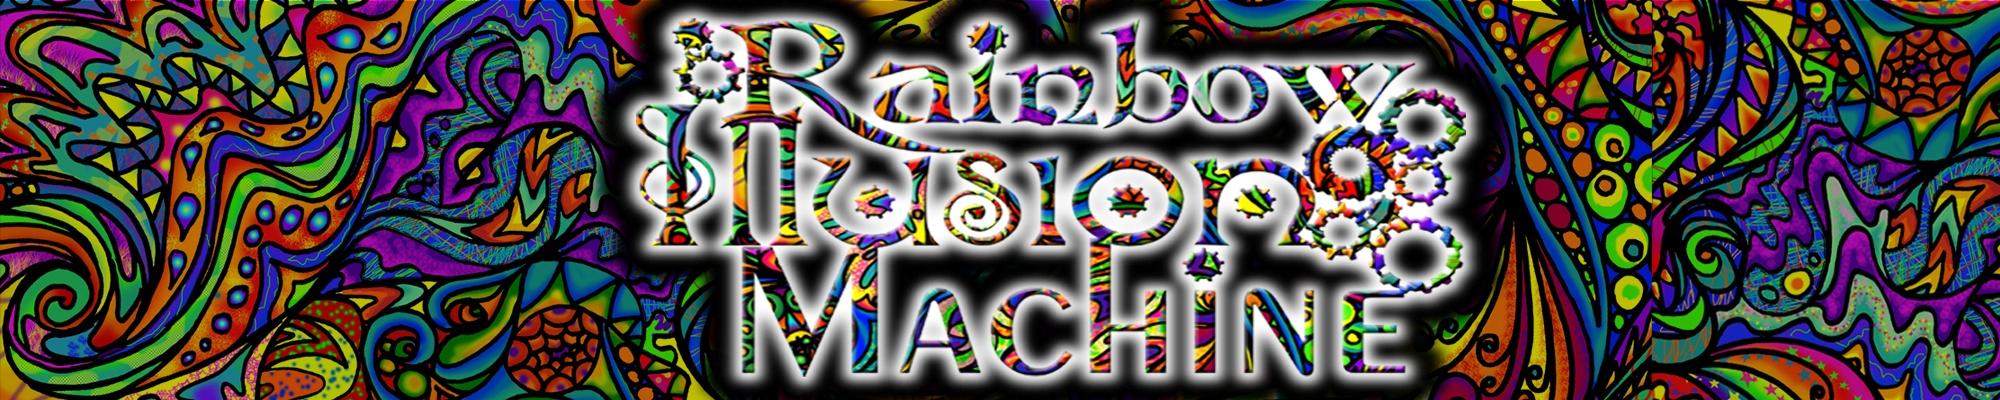 rainbowillusionmachine Cover